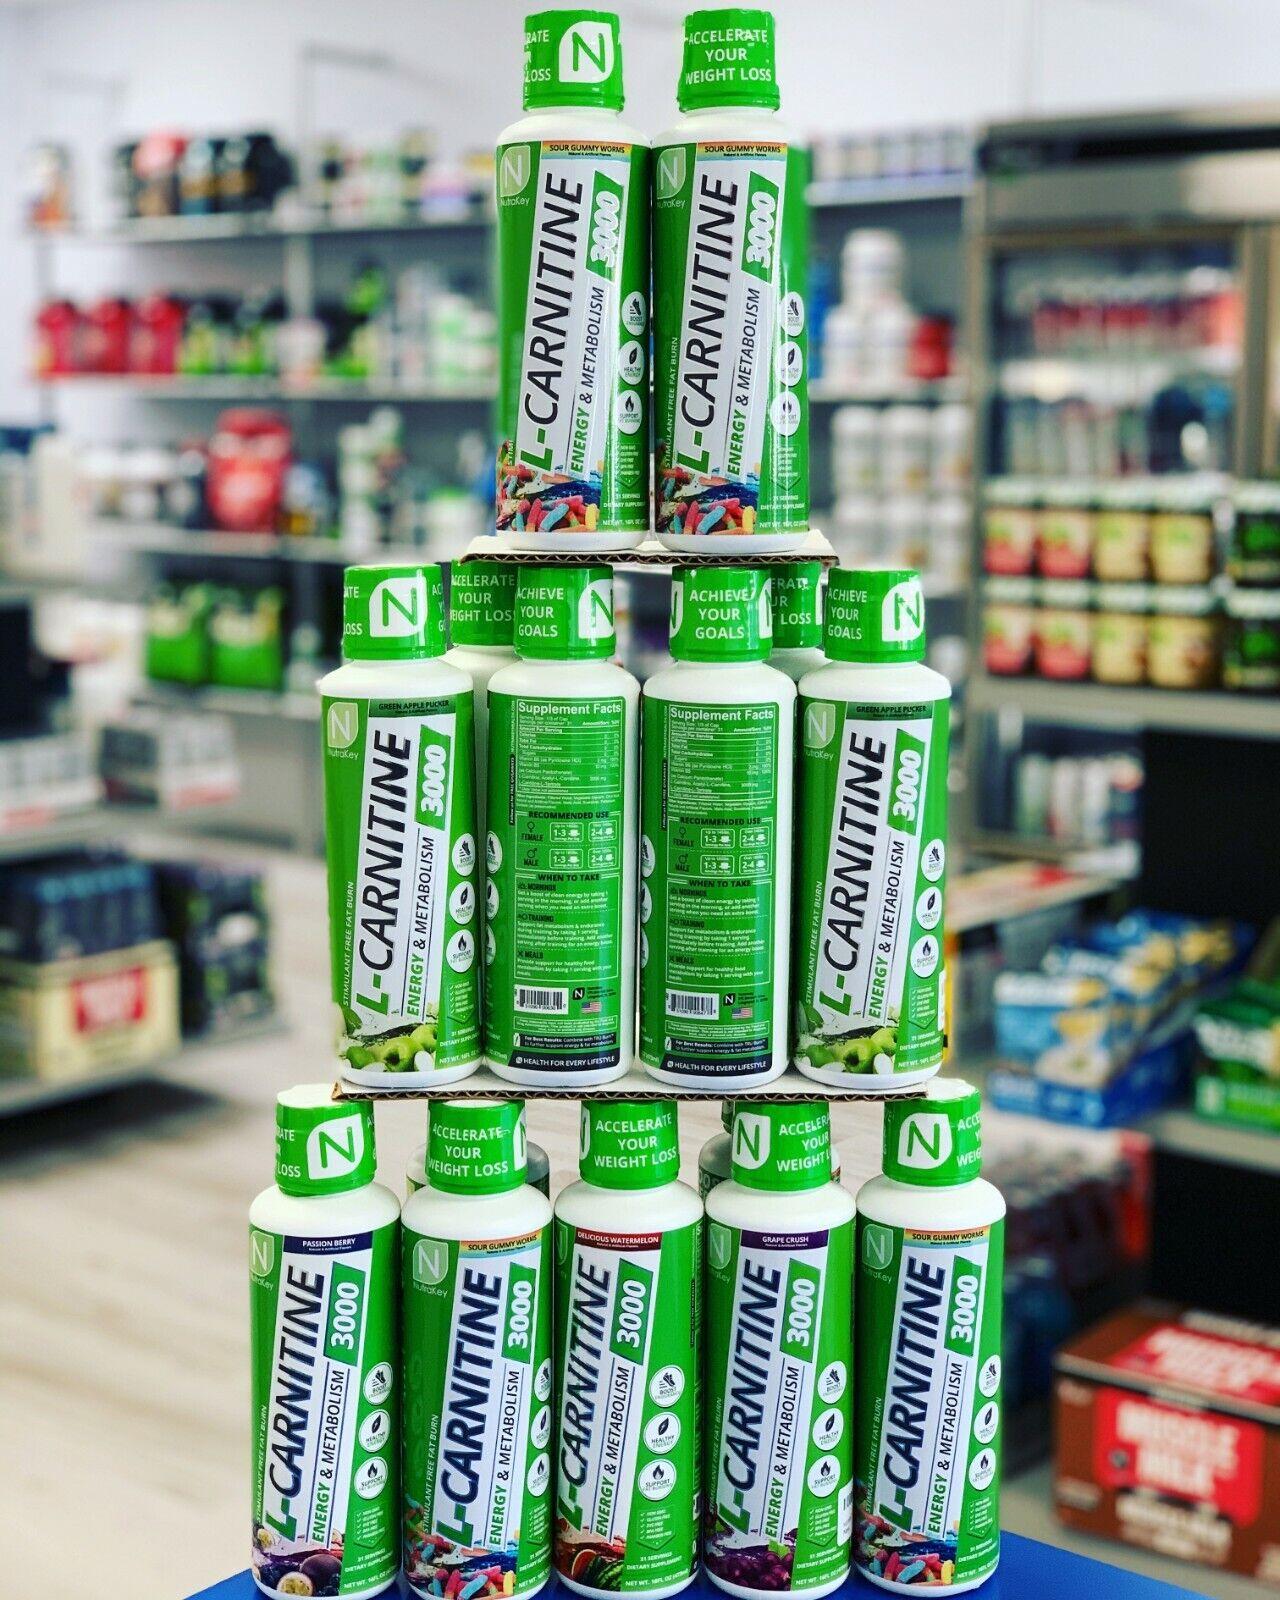 Nutrakey L-CARNITINE Liquid 3000 Fat Burner Energy / Metabolism Booster 16 oz